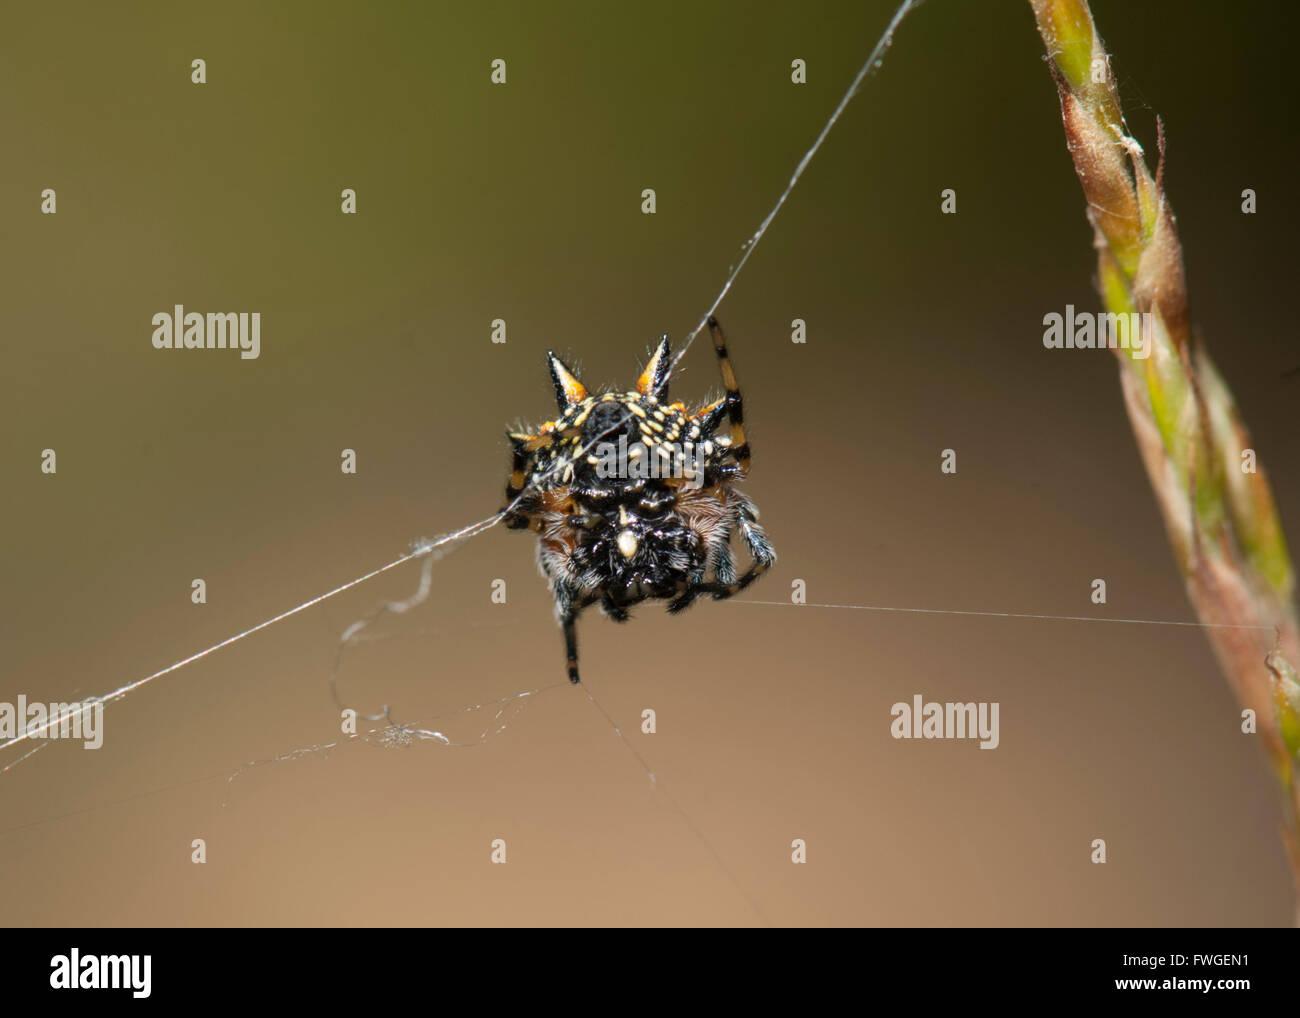 Underside of an Australian Jewel Spider (Austracantha minax), Western Australia, Australia - Stock Image